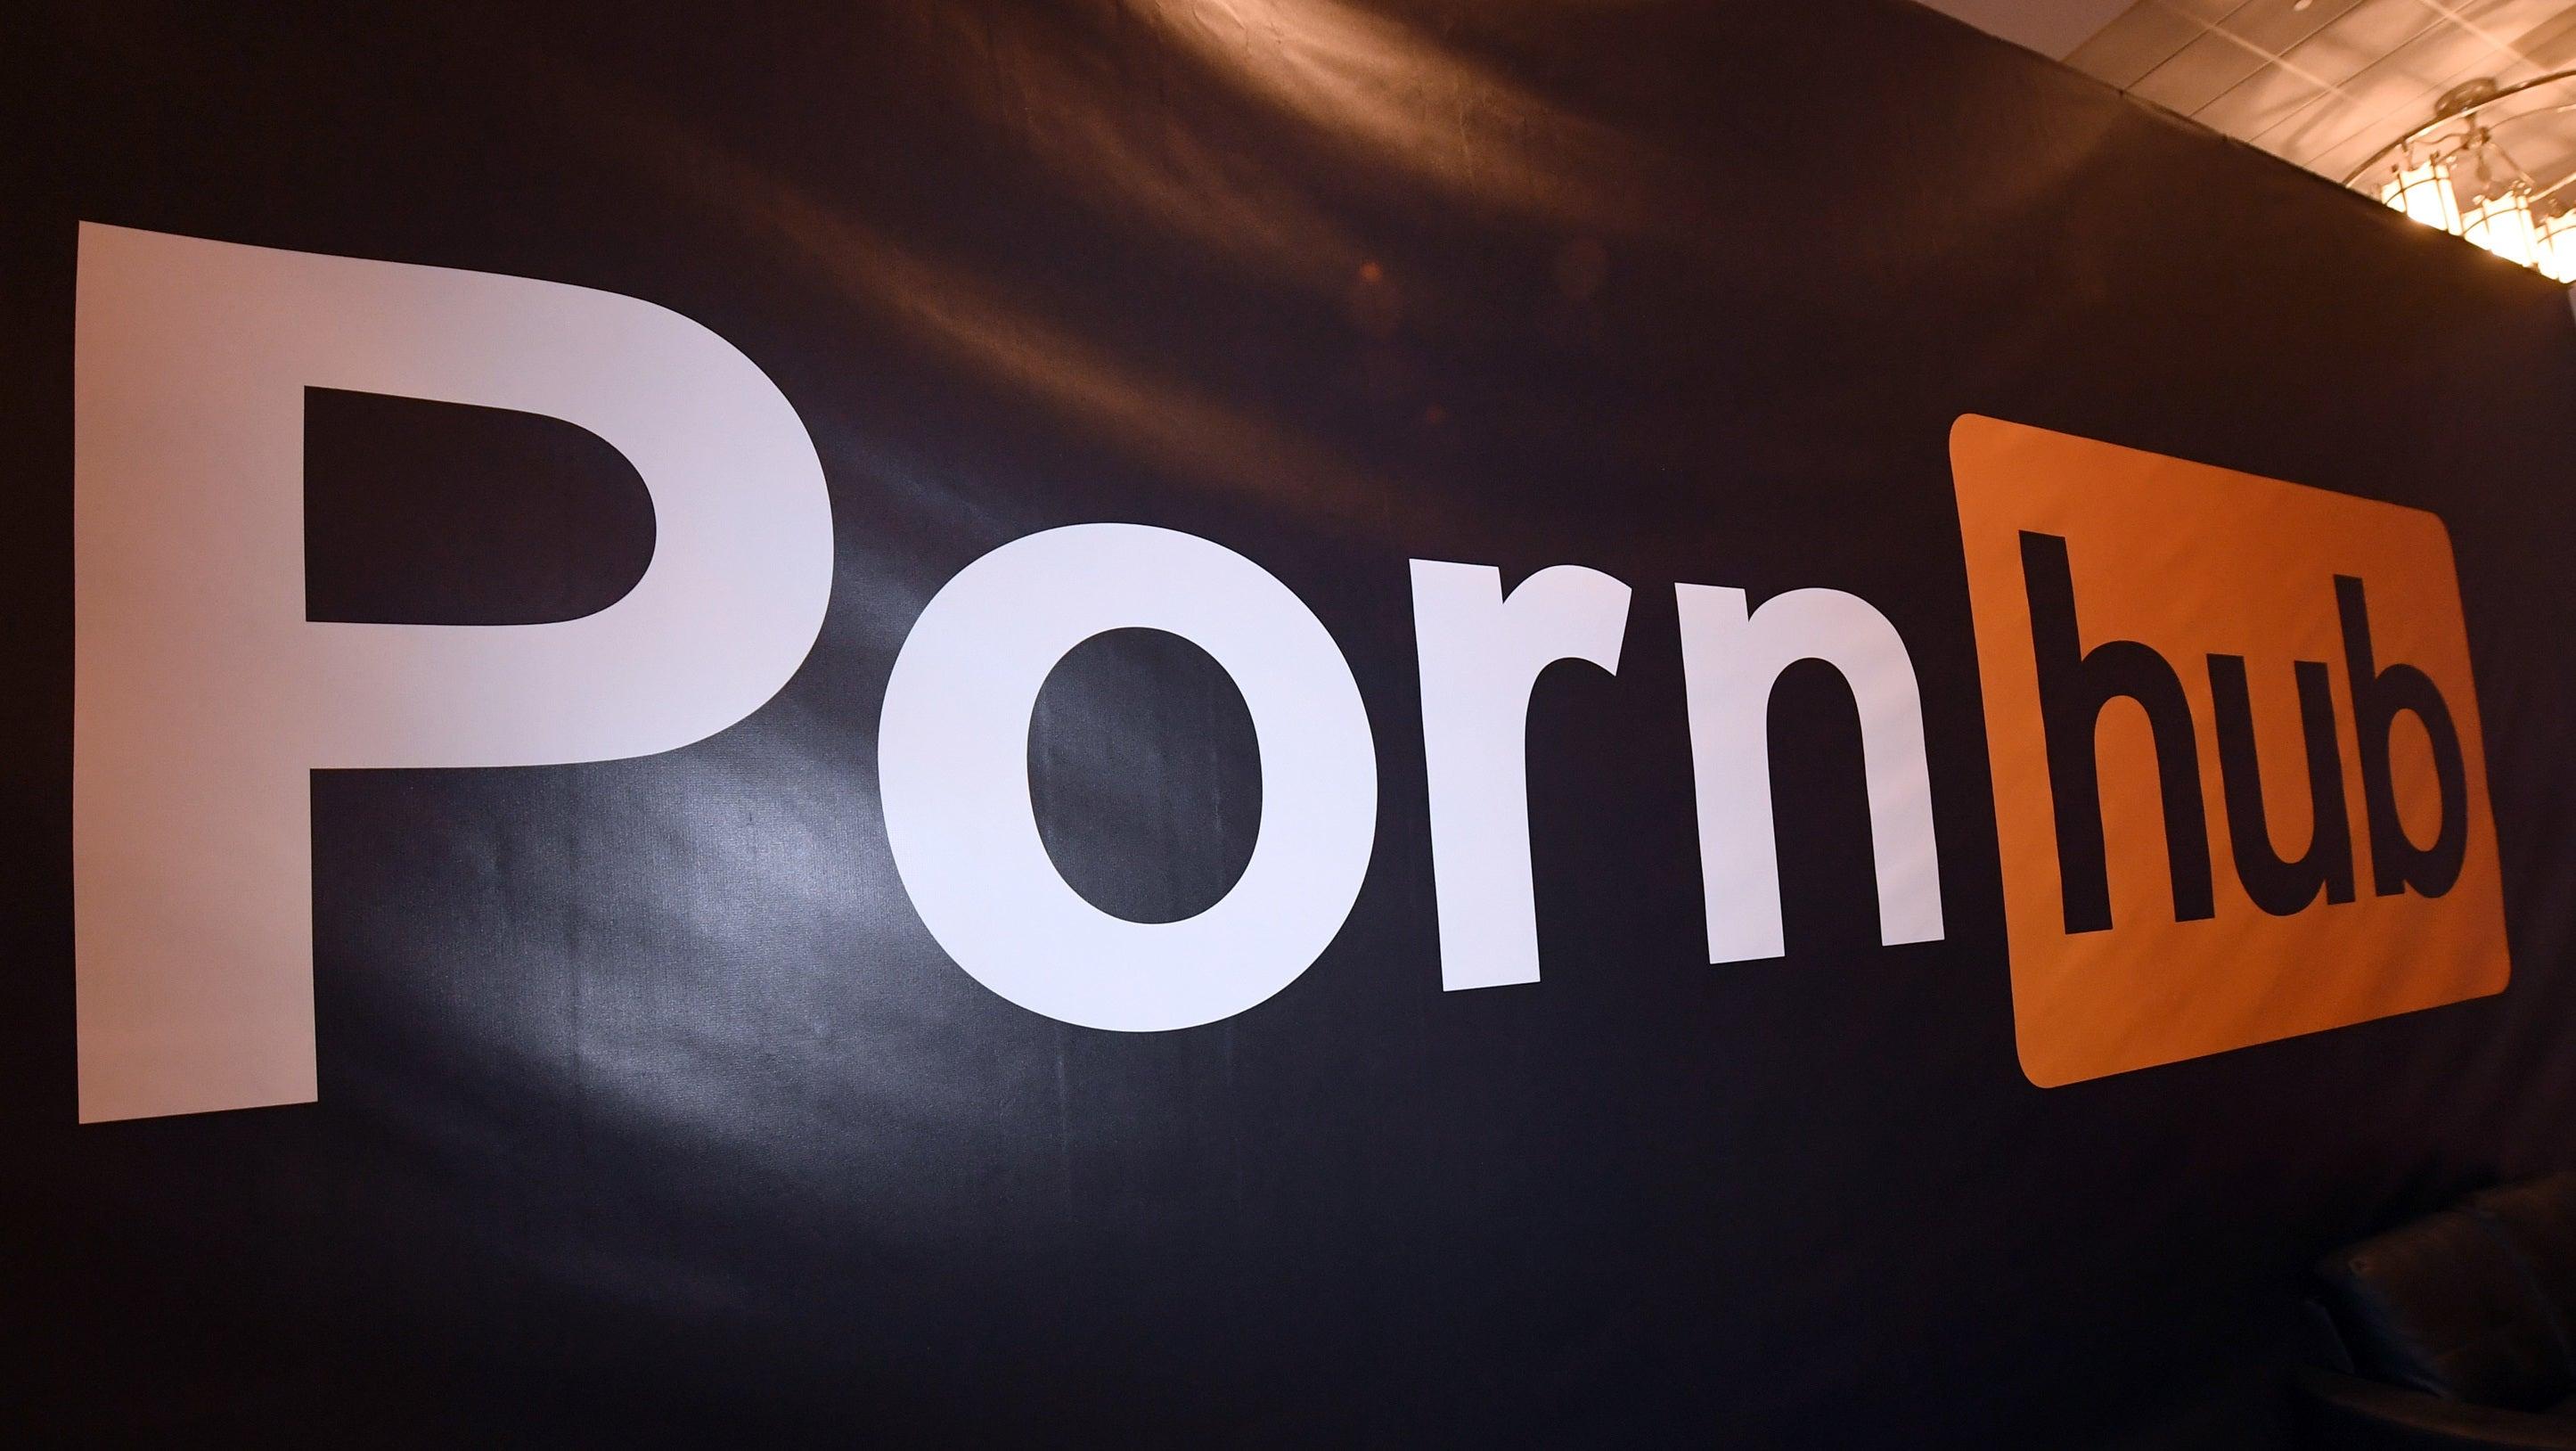 New Jersey Man Sues Pornhub For Ad Using His Money-Flashing Selfie